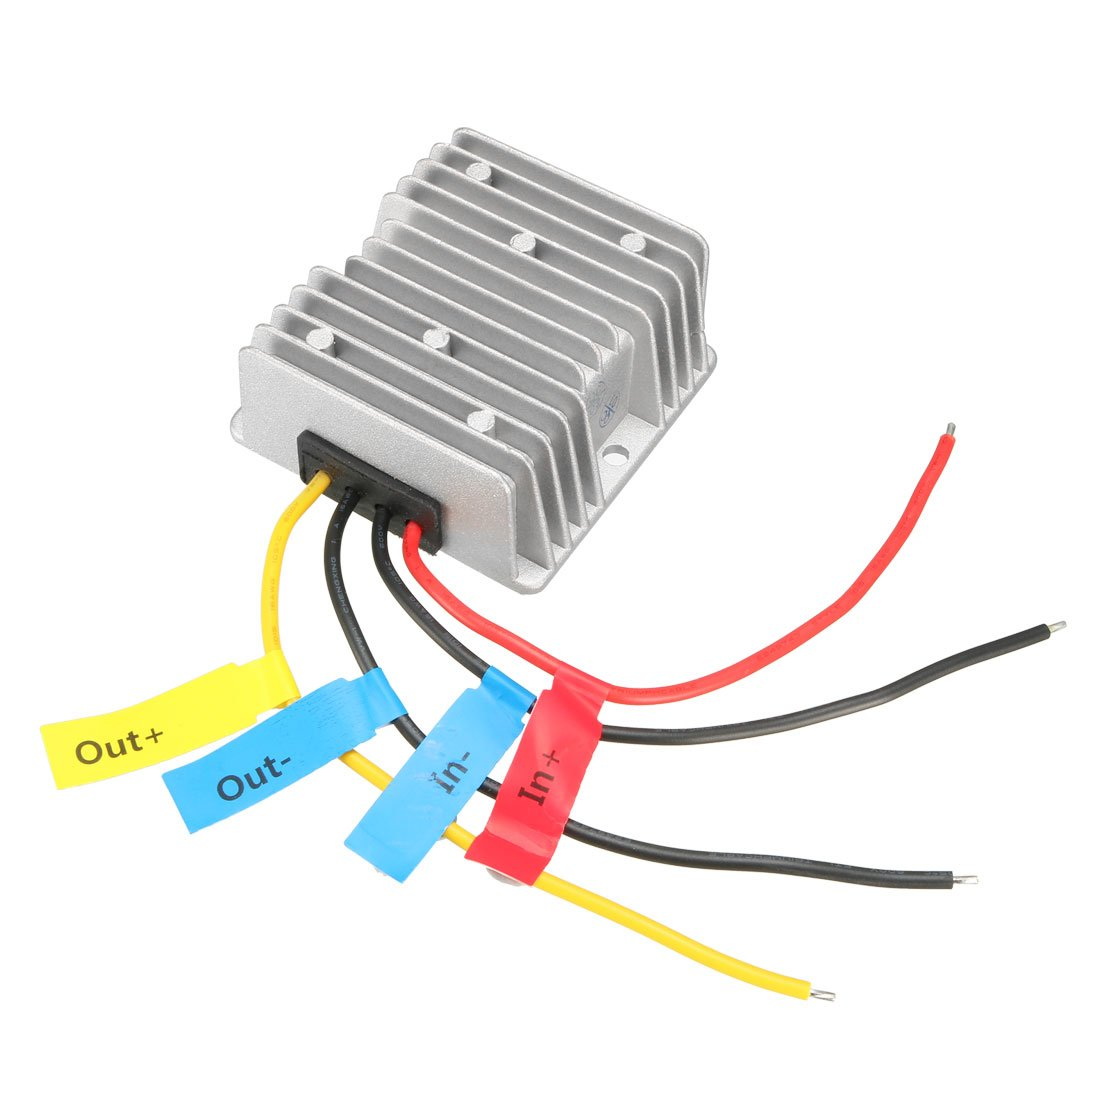 uxcell DC 48V to DC 24V 10A 240W Waterproof Car Power Supply Module Voltage Converter Regulator Transformer